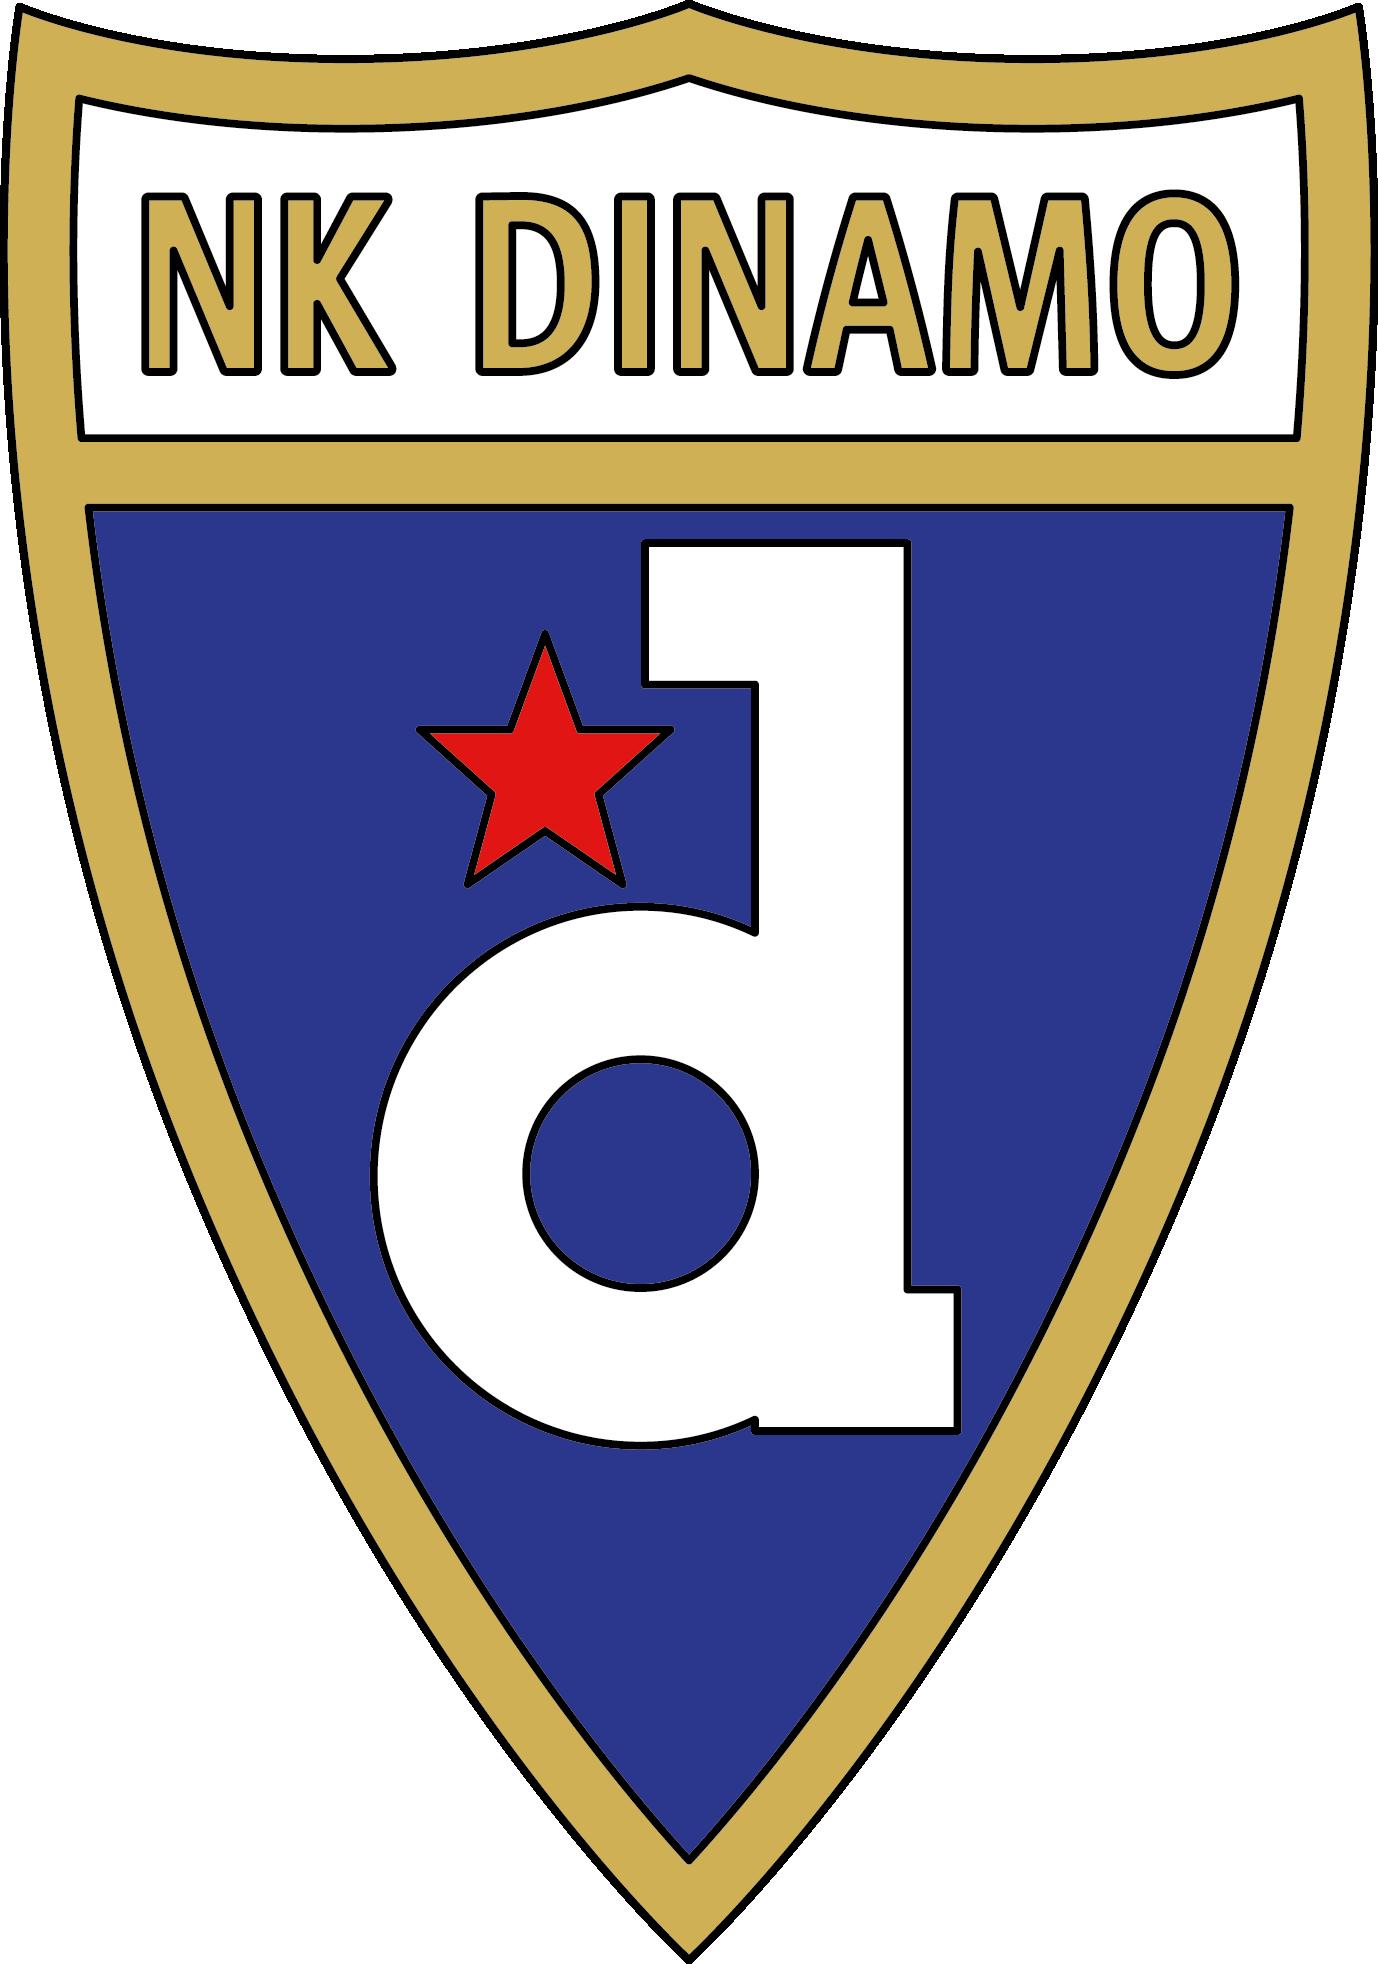 Wo 12 Juni 1963 20u15 Cet 1e Wedstrijd Nk Dinamo Zagreb 1 Cf Valencia 2 In Zagreb Stadion Maksimir Futbol The Globe